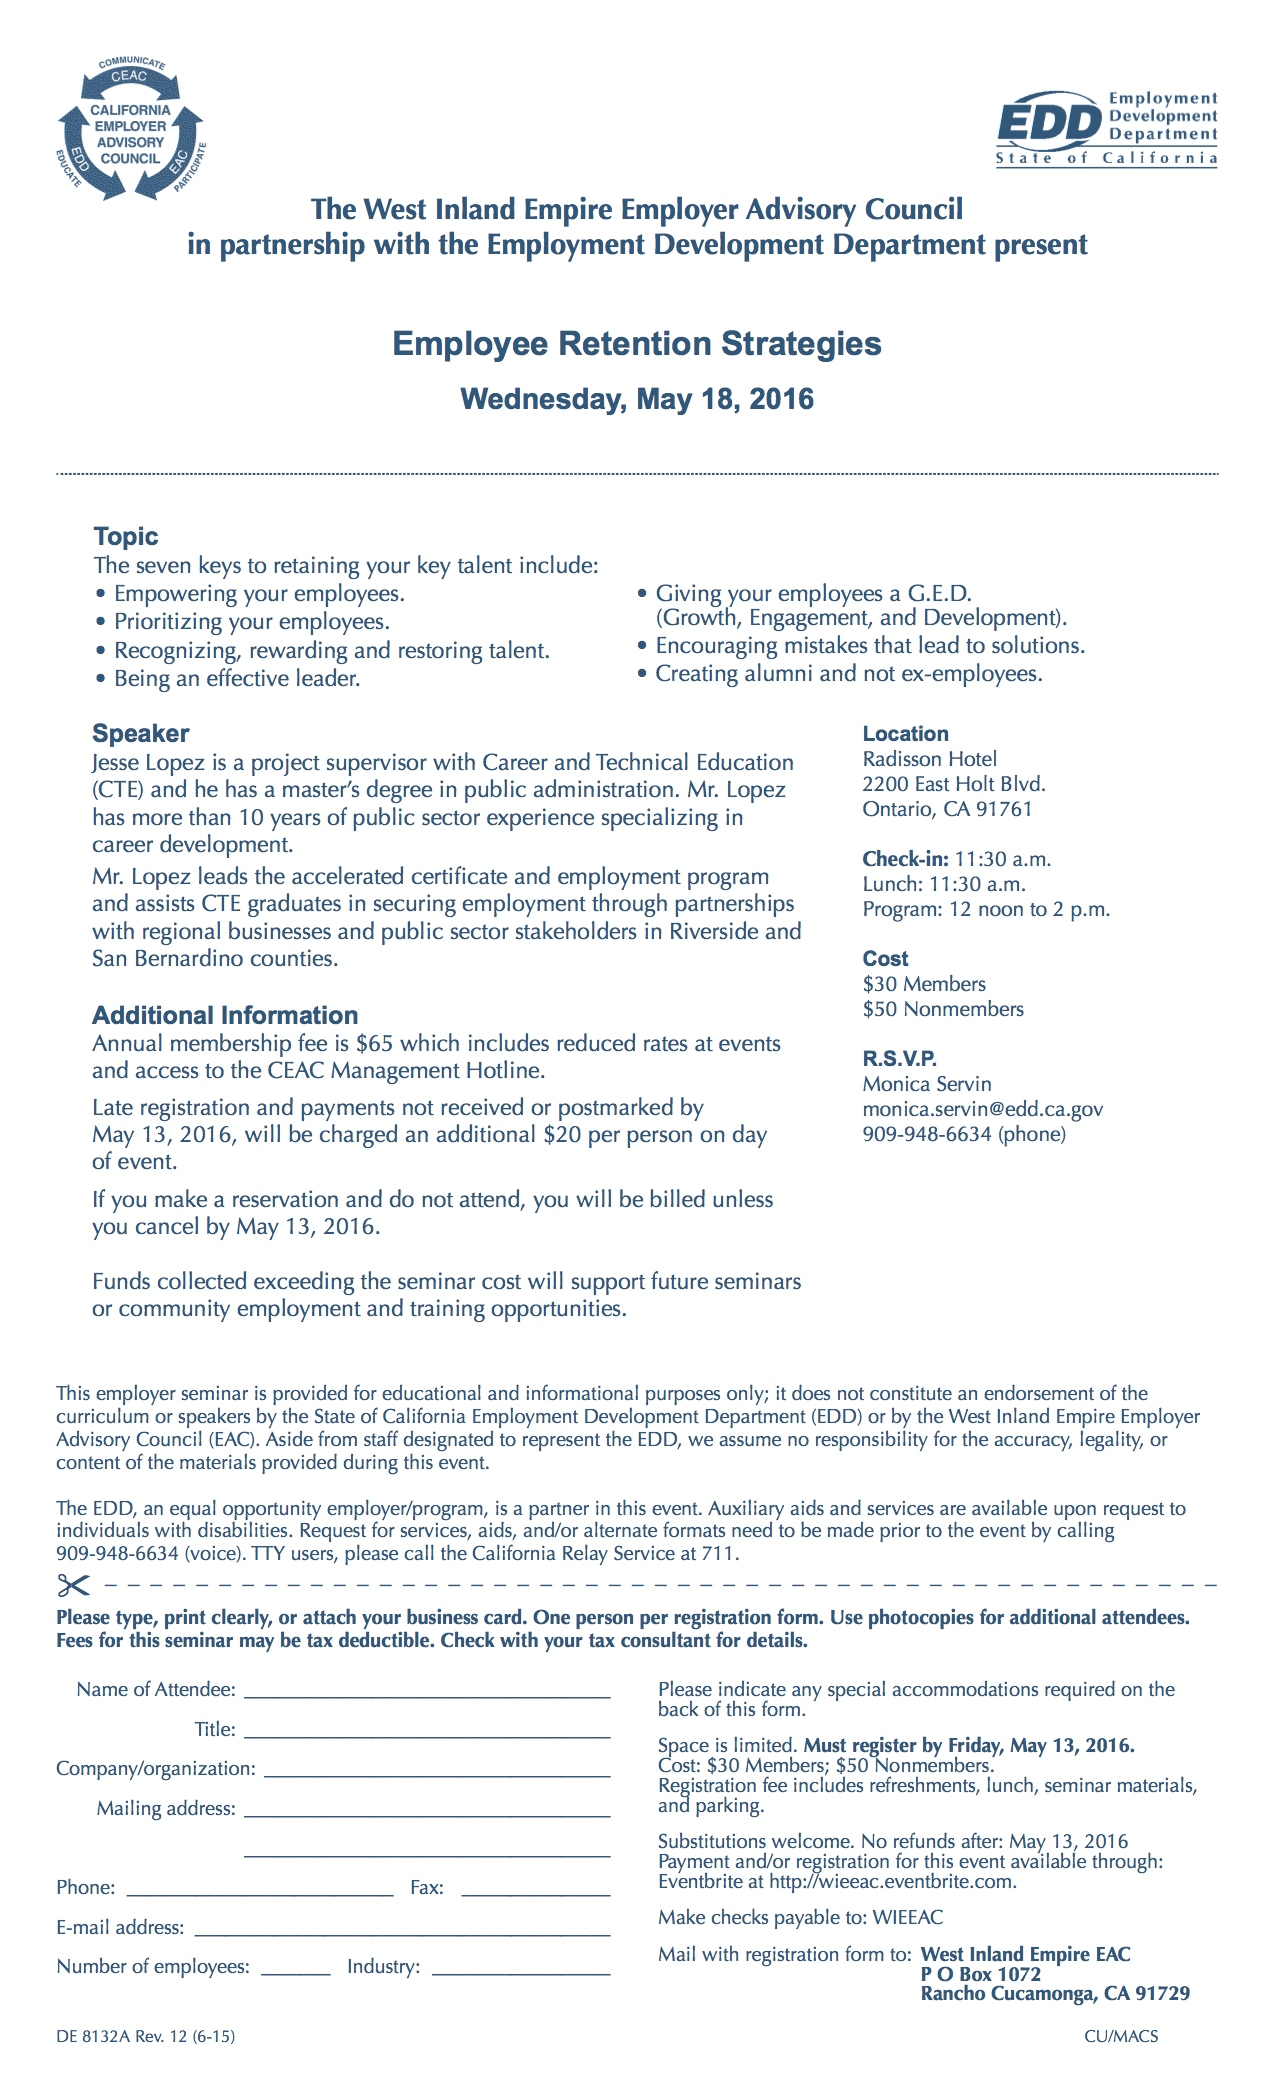 Employee Retention Flyer